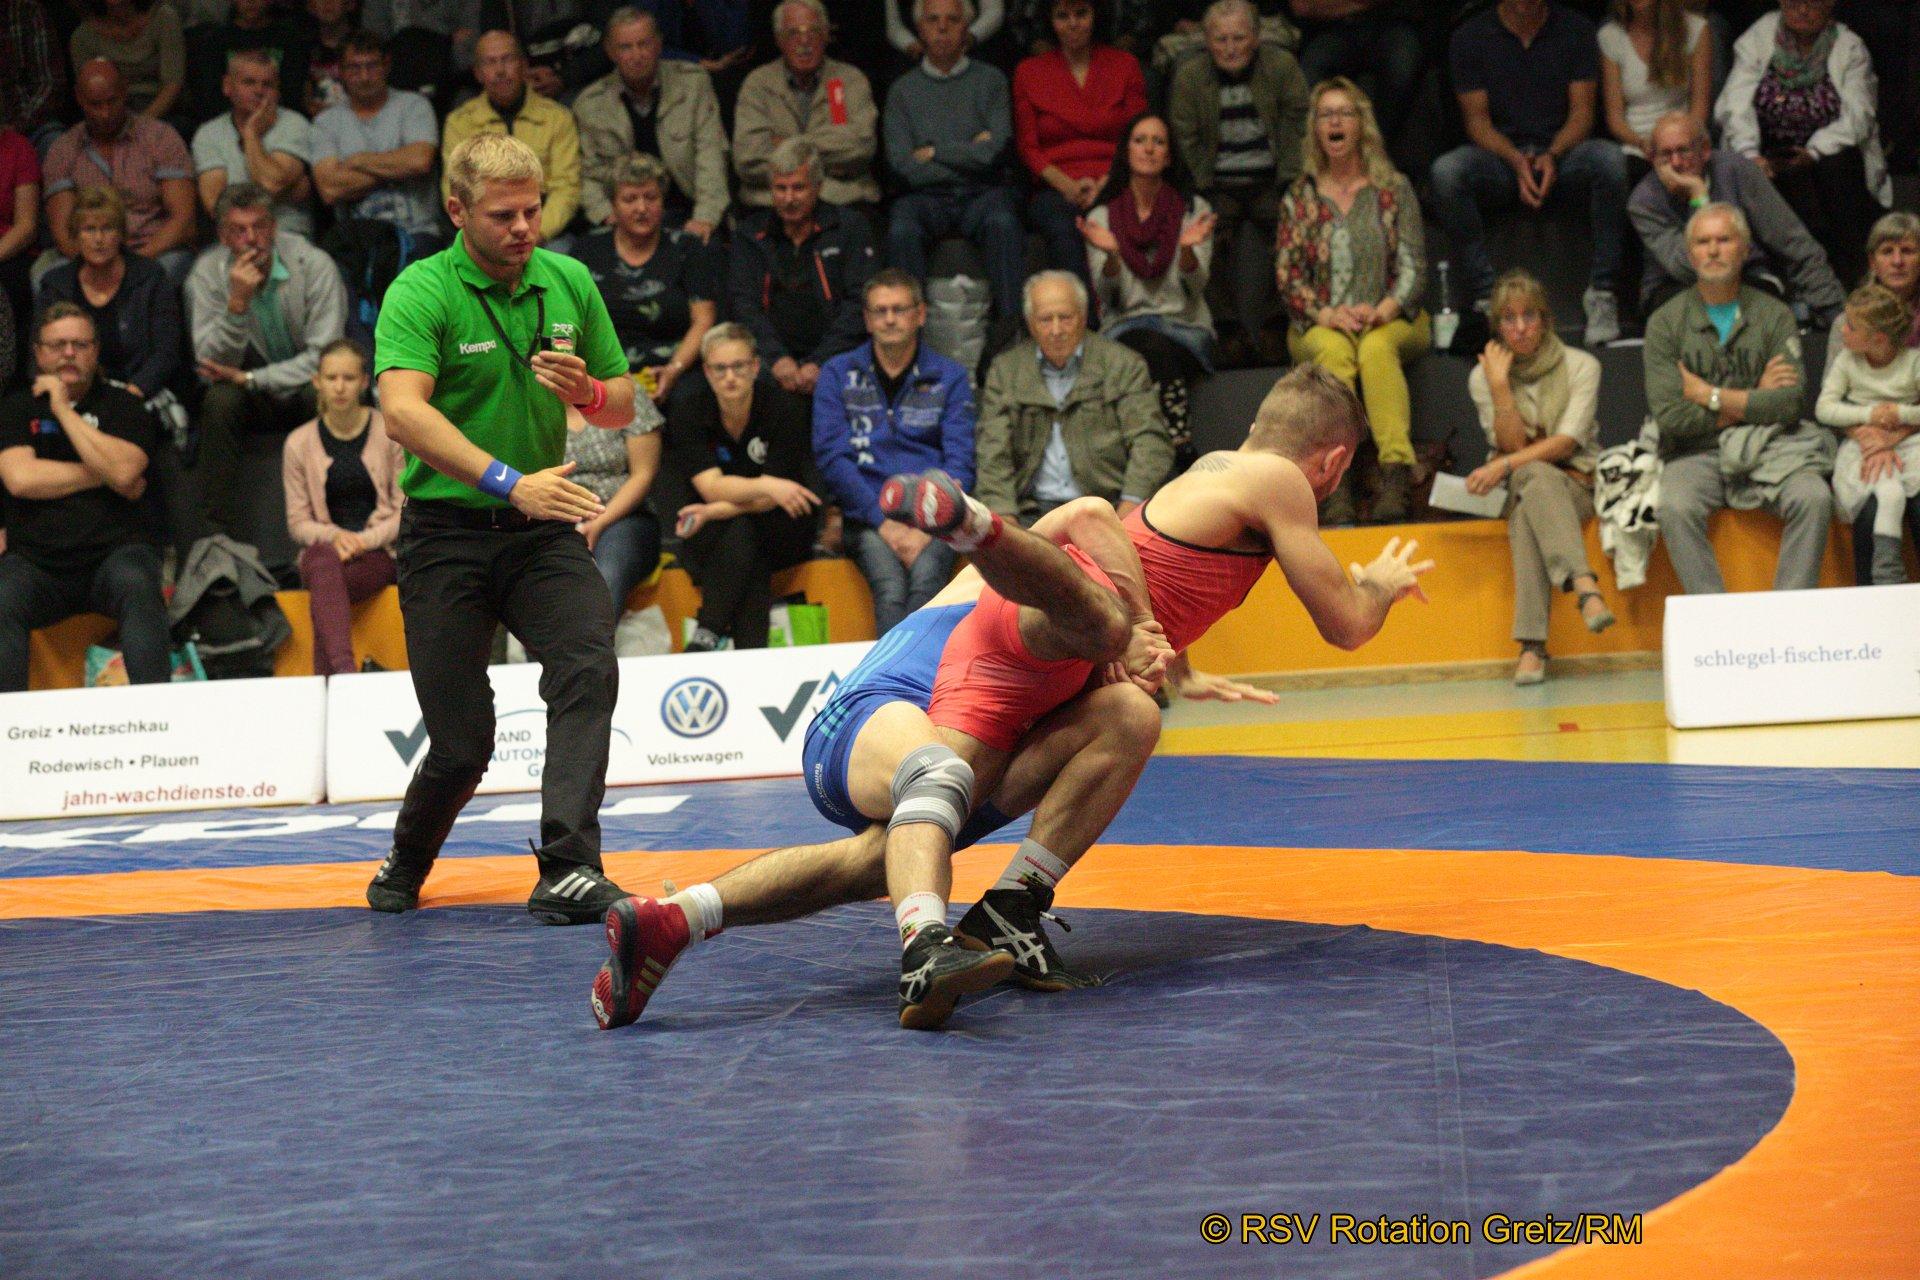 61kg Greco: Alexander Grebensikov (2) (rotes Trikot), RSV Rotation Greiz gegen Razvan Arnautu EU (5), ASV Schorndorf 0:4/TÜ/0:15/02:45